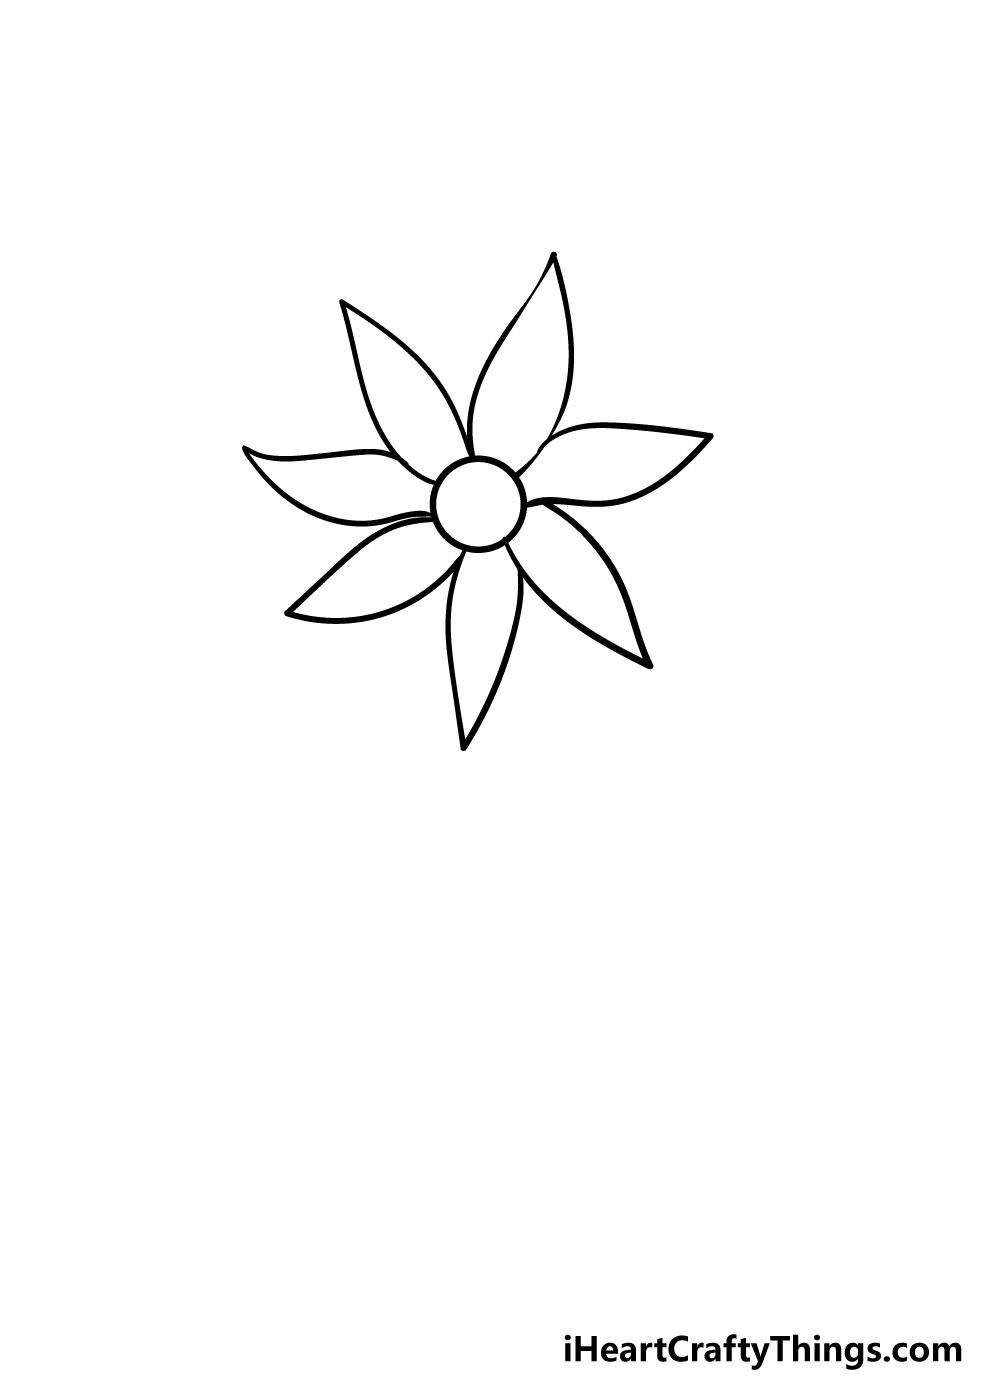 flower drawing step 6